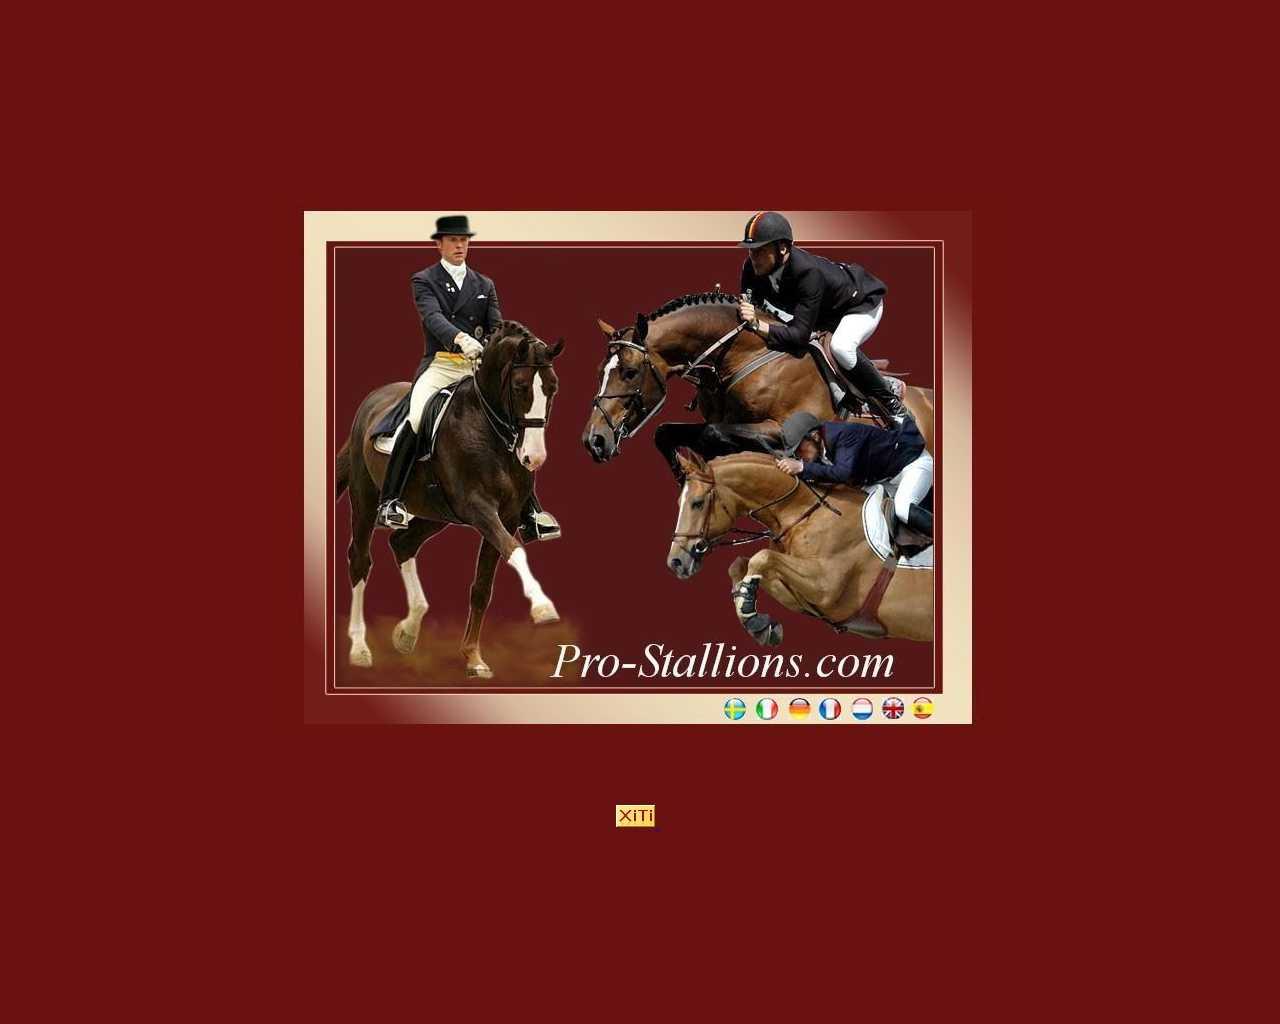 Pro-stallions.com